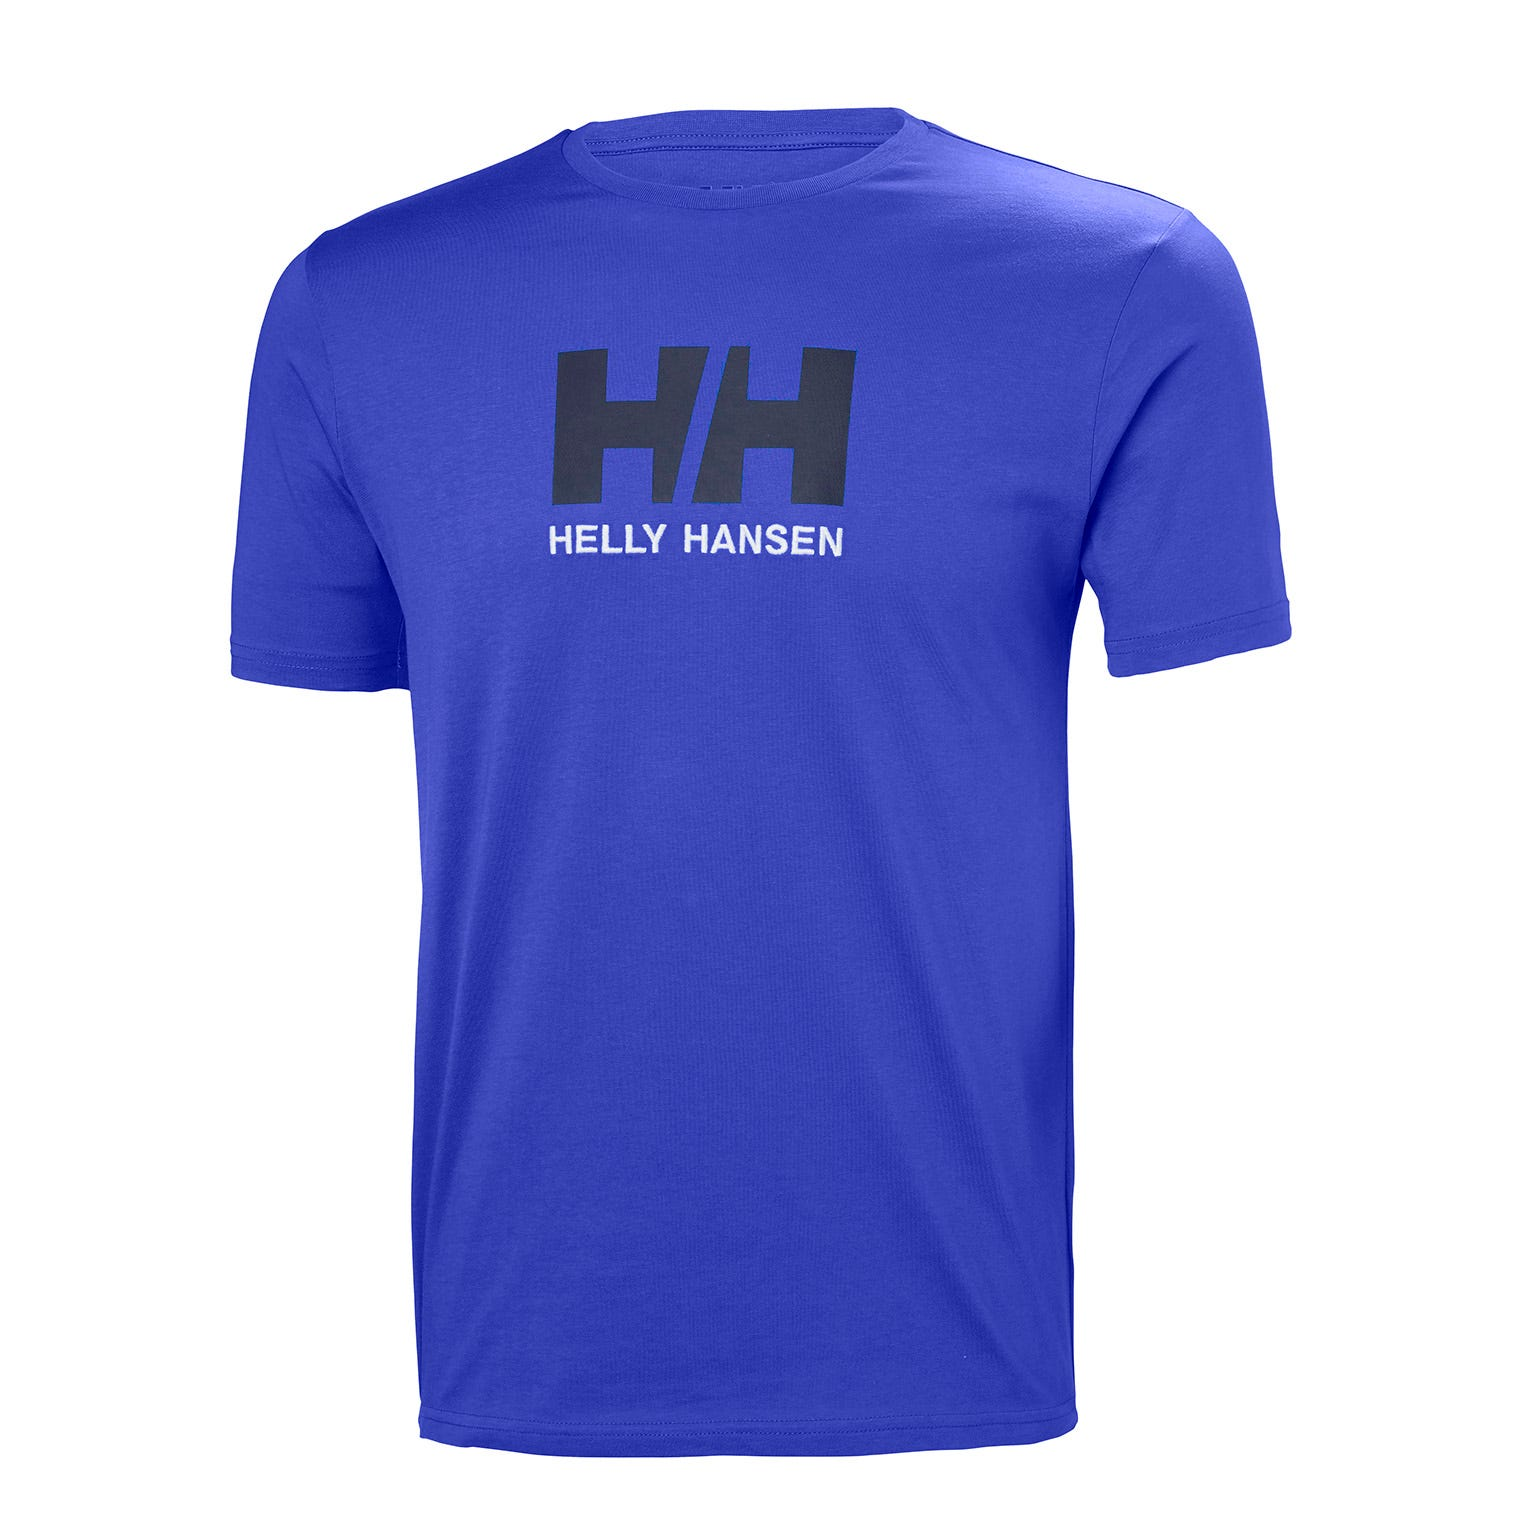 Helly Hansen Mens Lifa Merino Lightweight Unique Tshirt   S